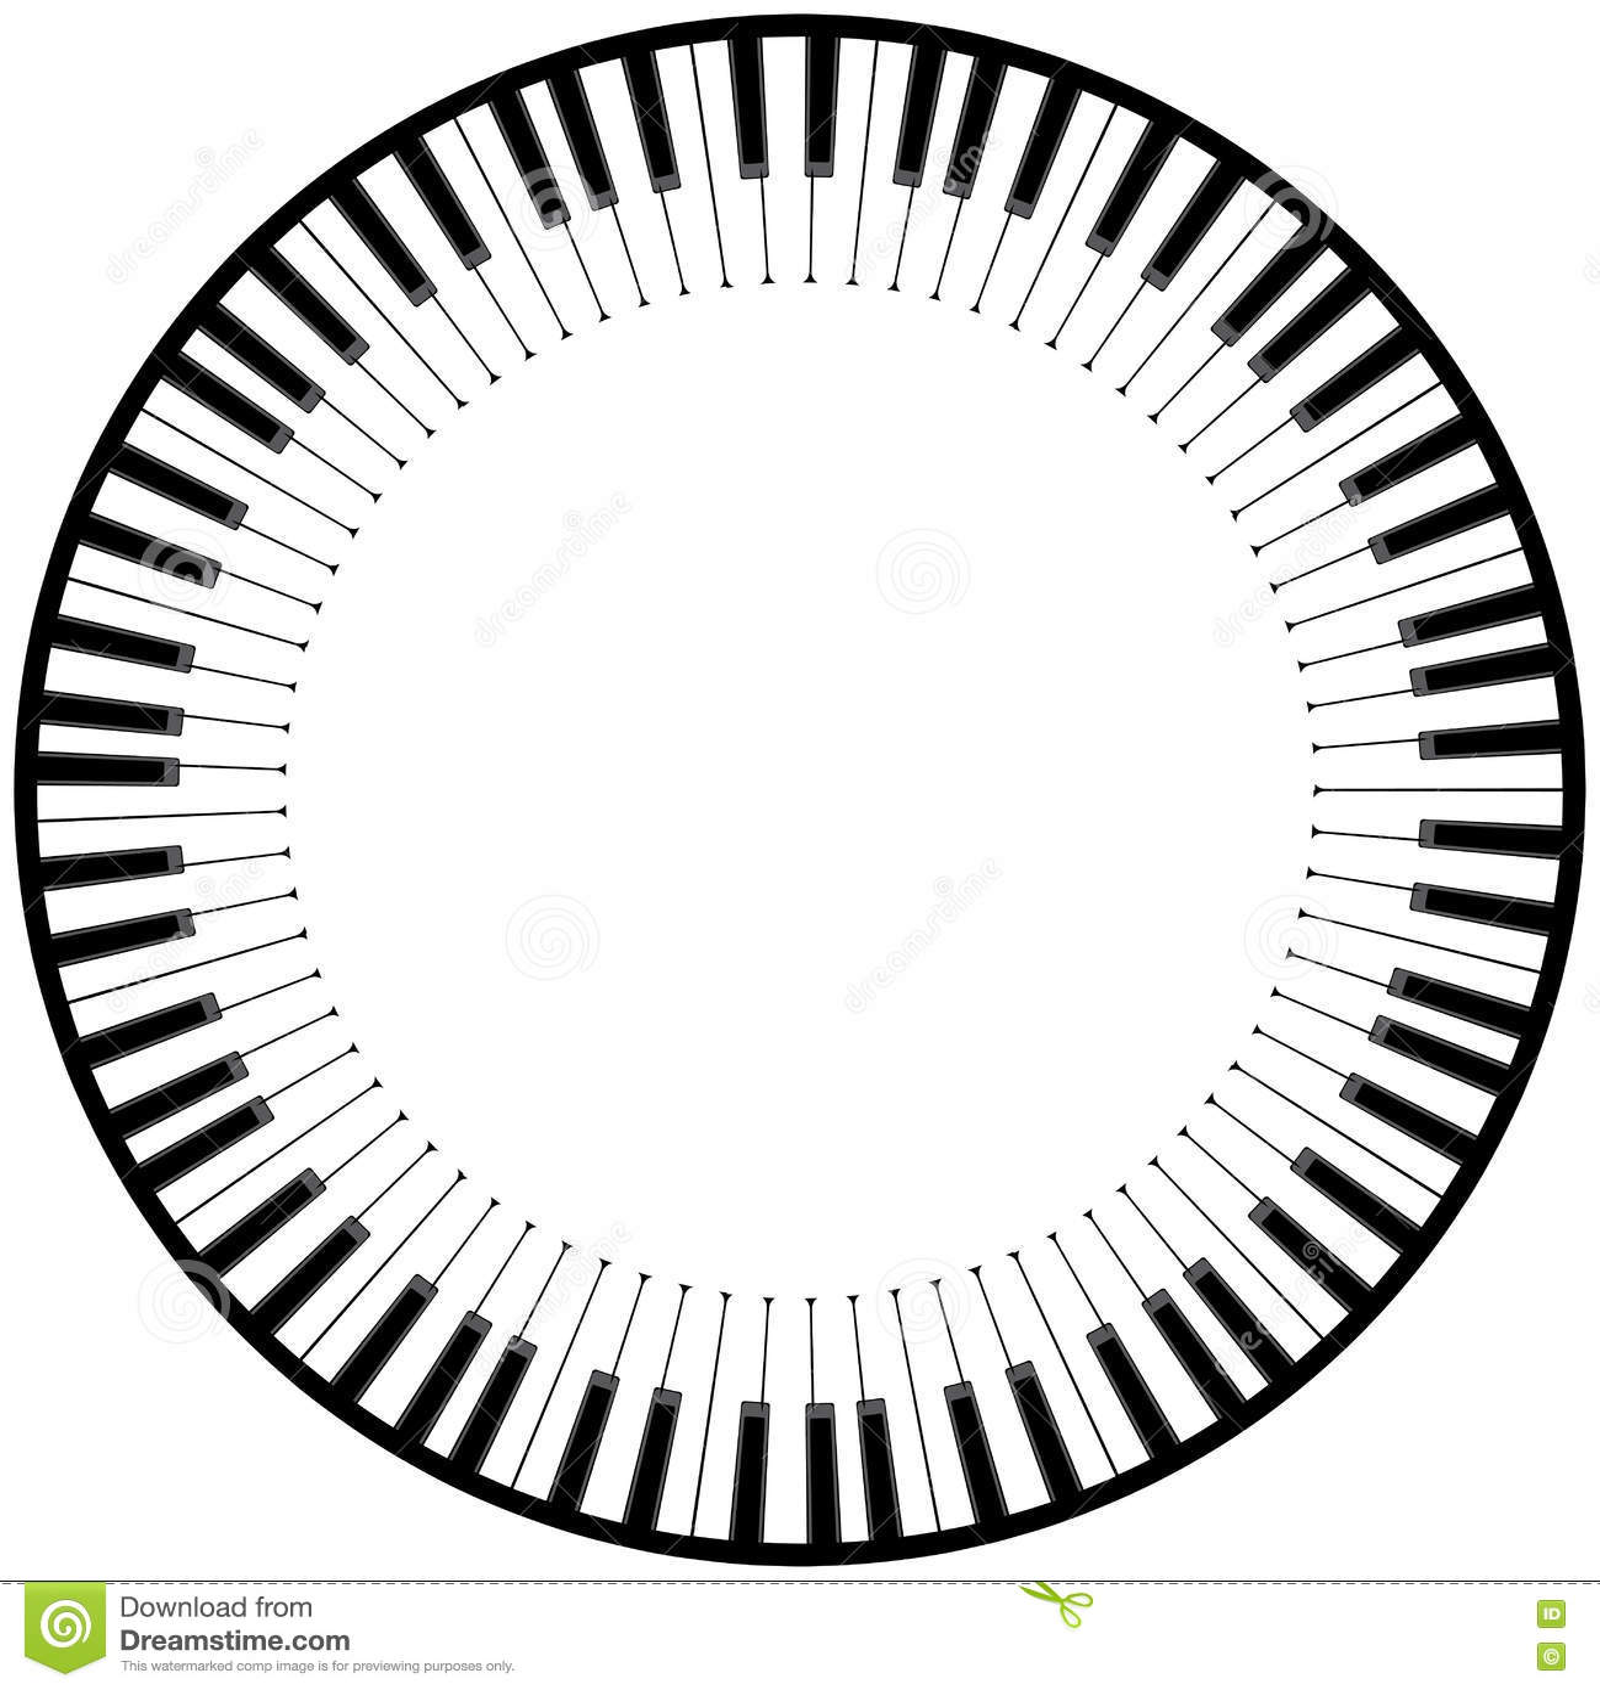 Piano Keyboard Illustration Stock Vector